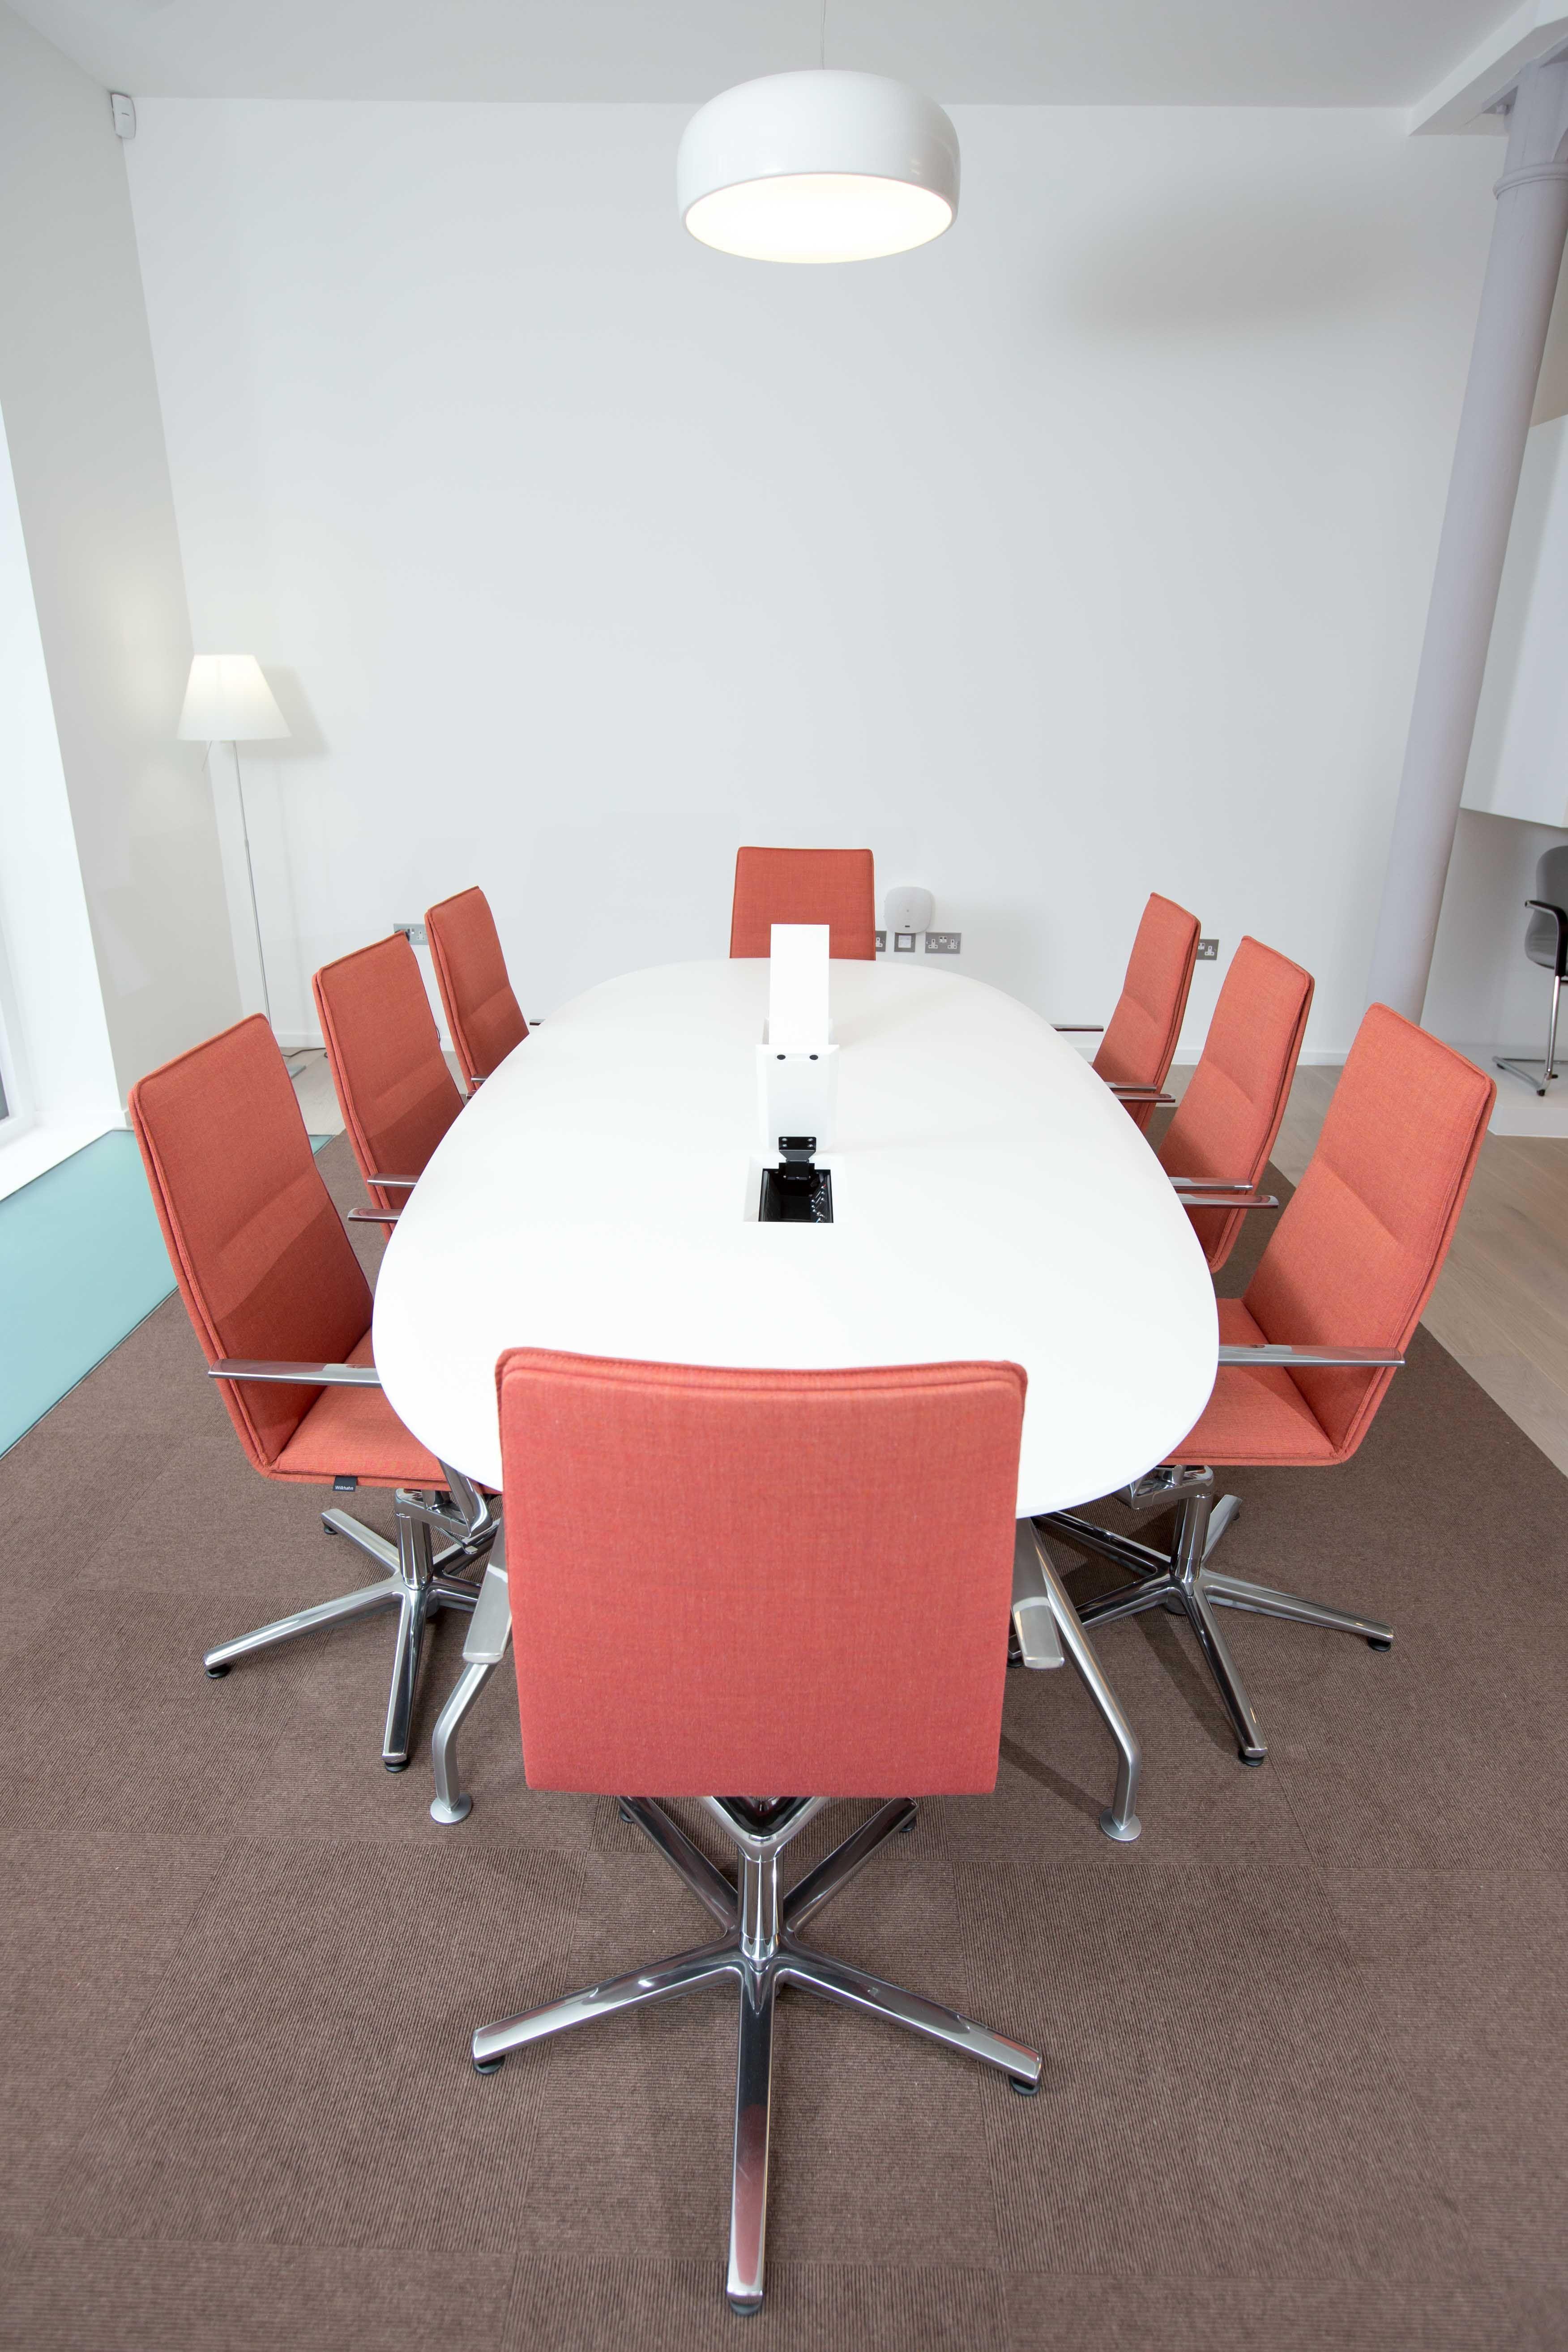 SOLA | Design: Justus Kolberg A distinctive frame. A chair that ...